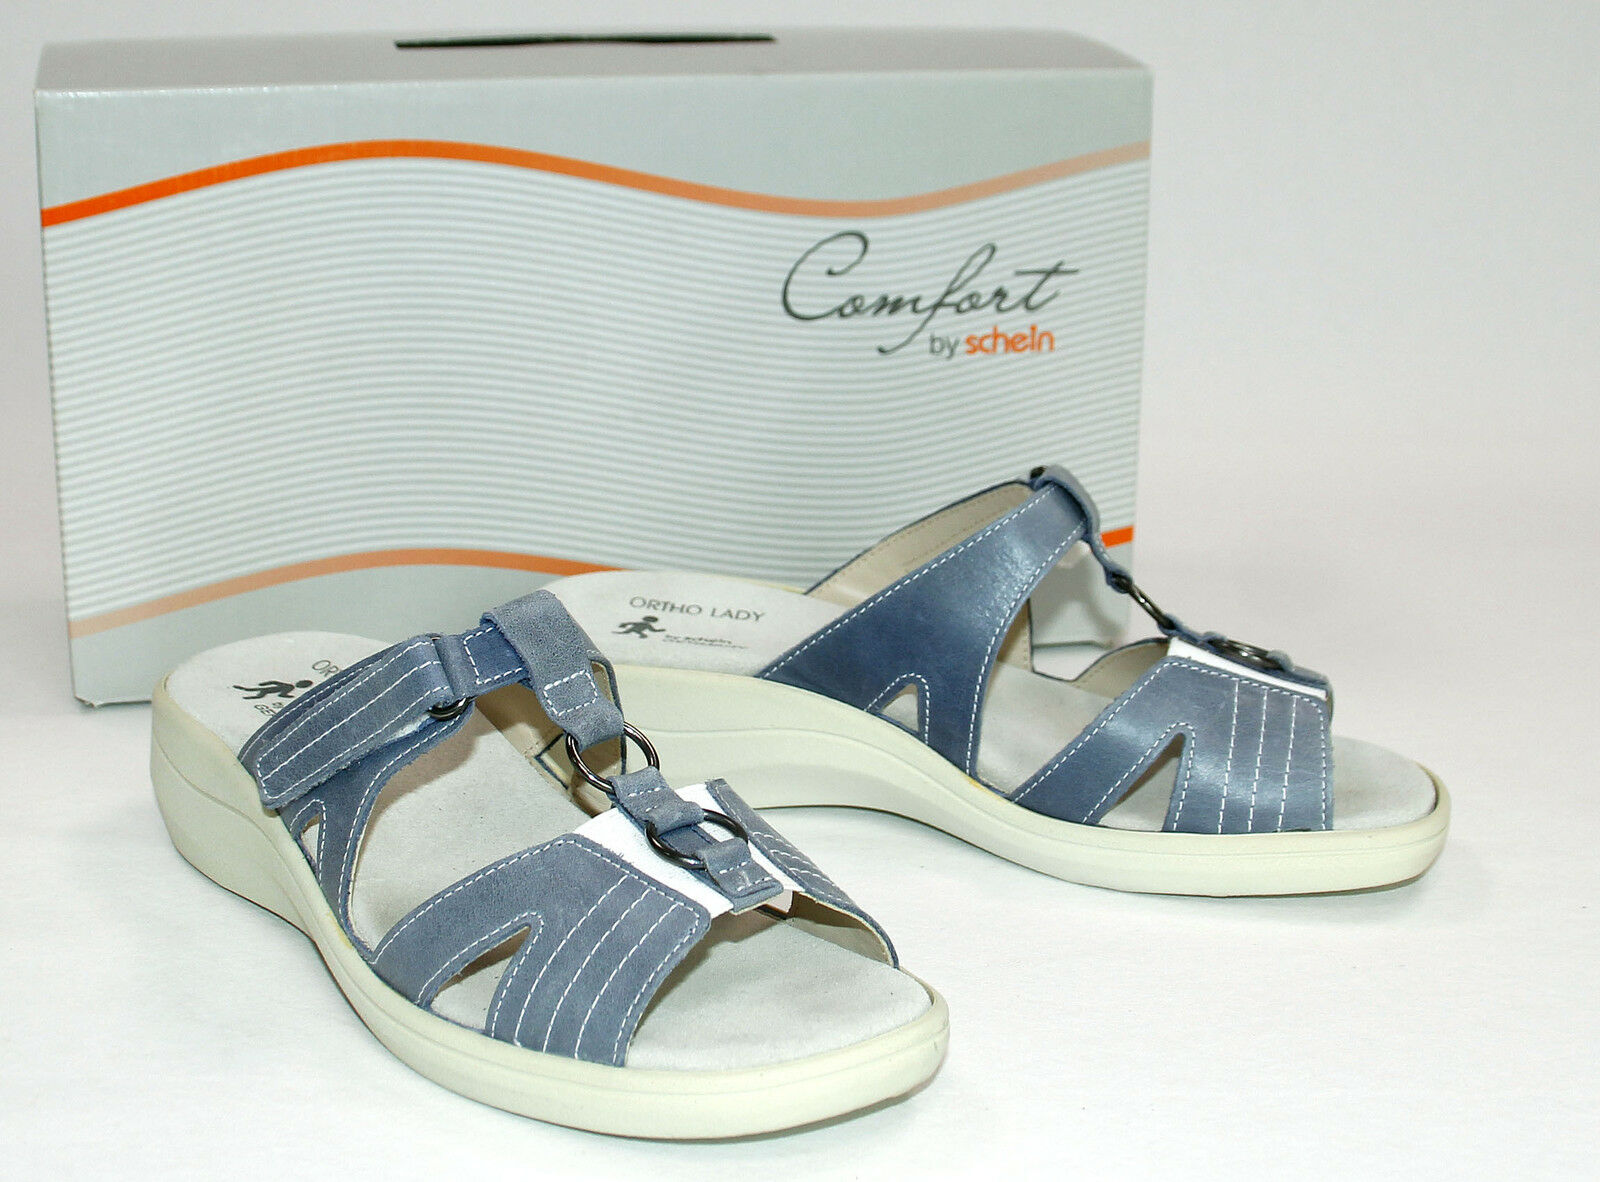 Ortho Lady Damen Sandale Pantolette metallic blau Größe 38,5